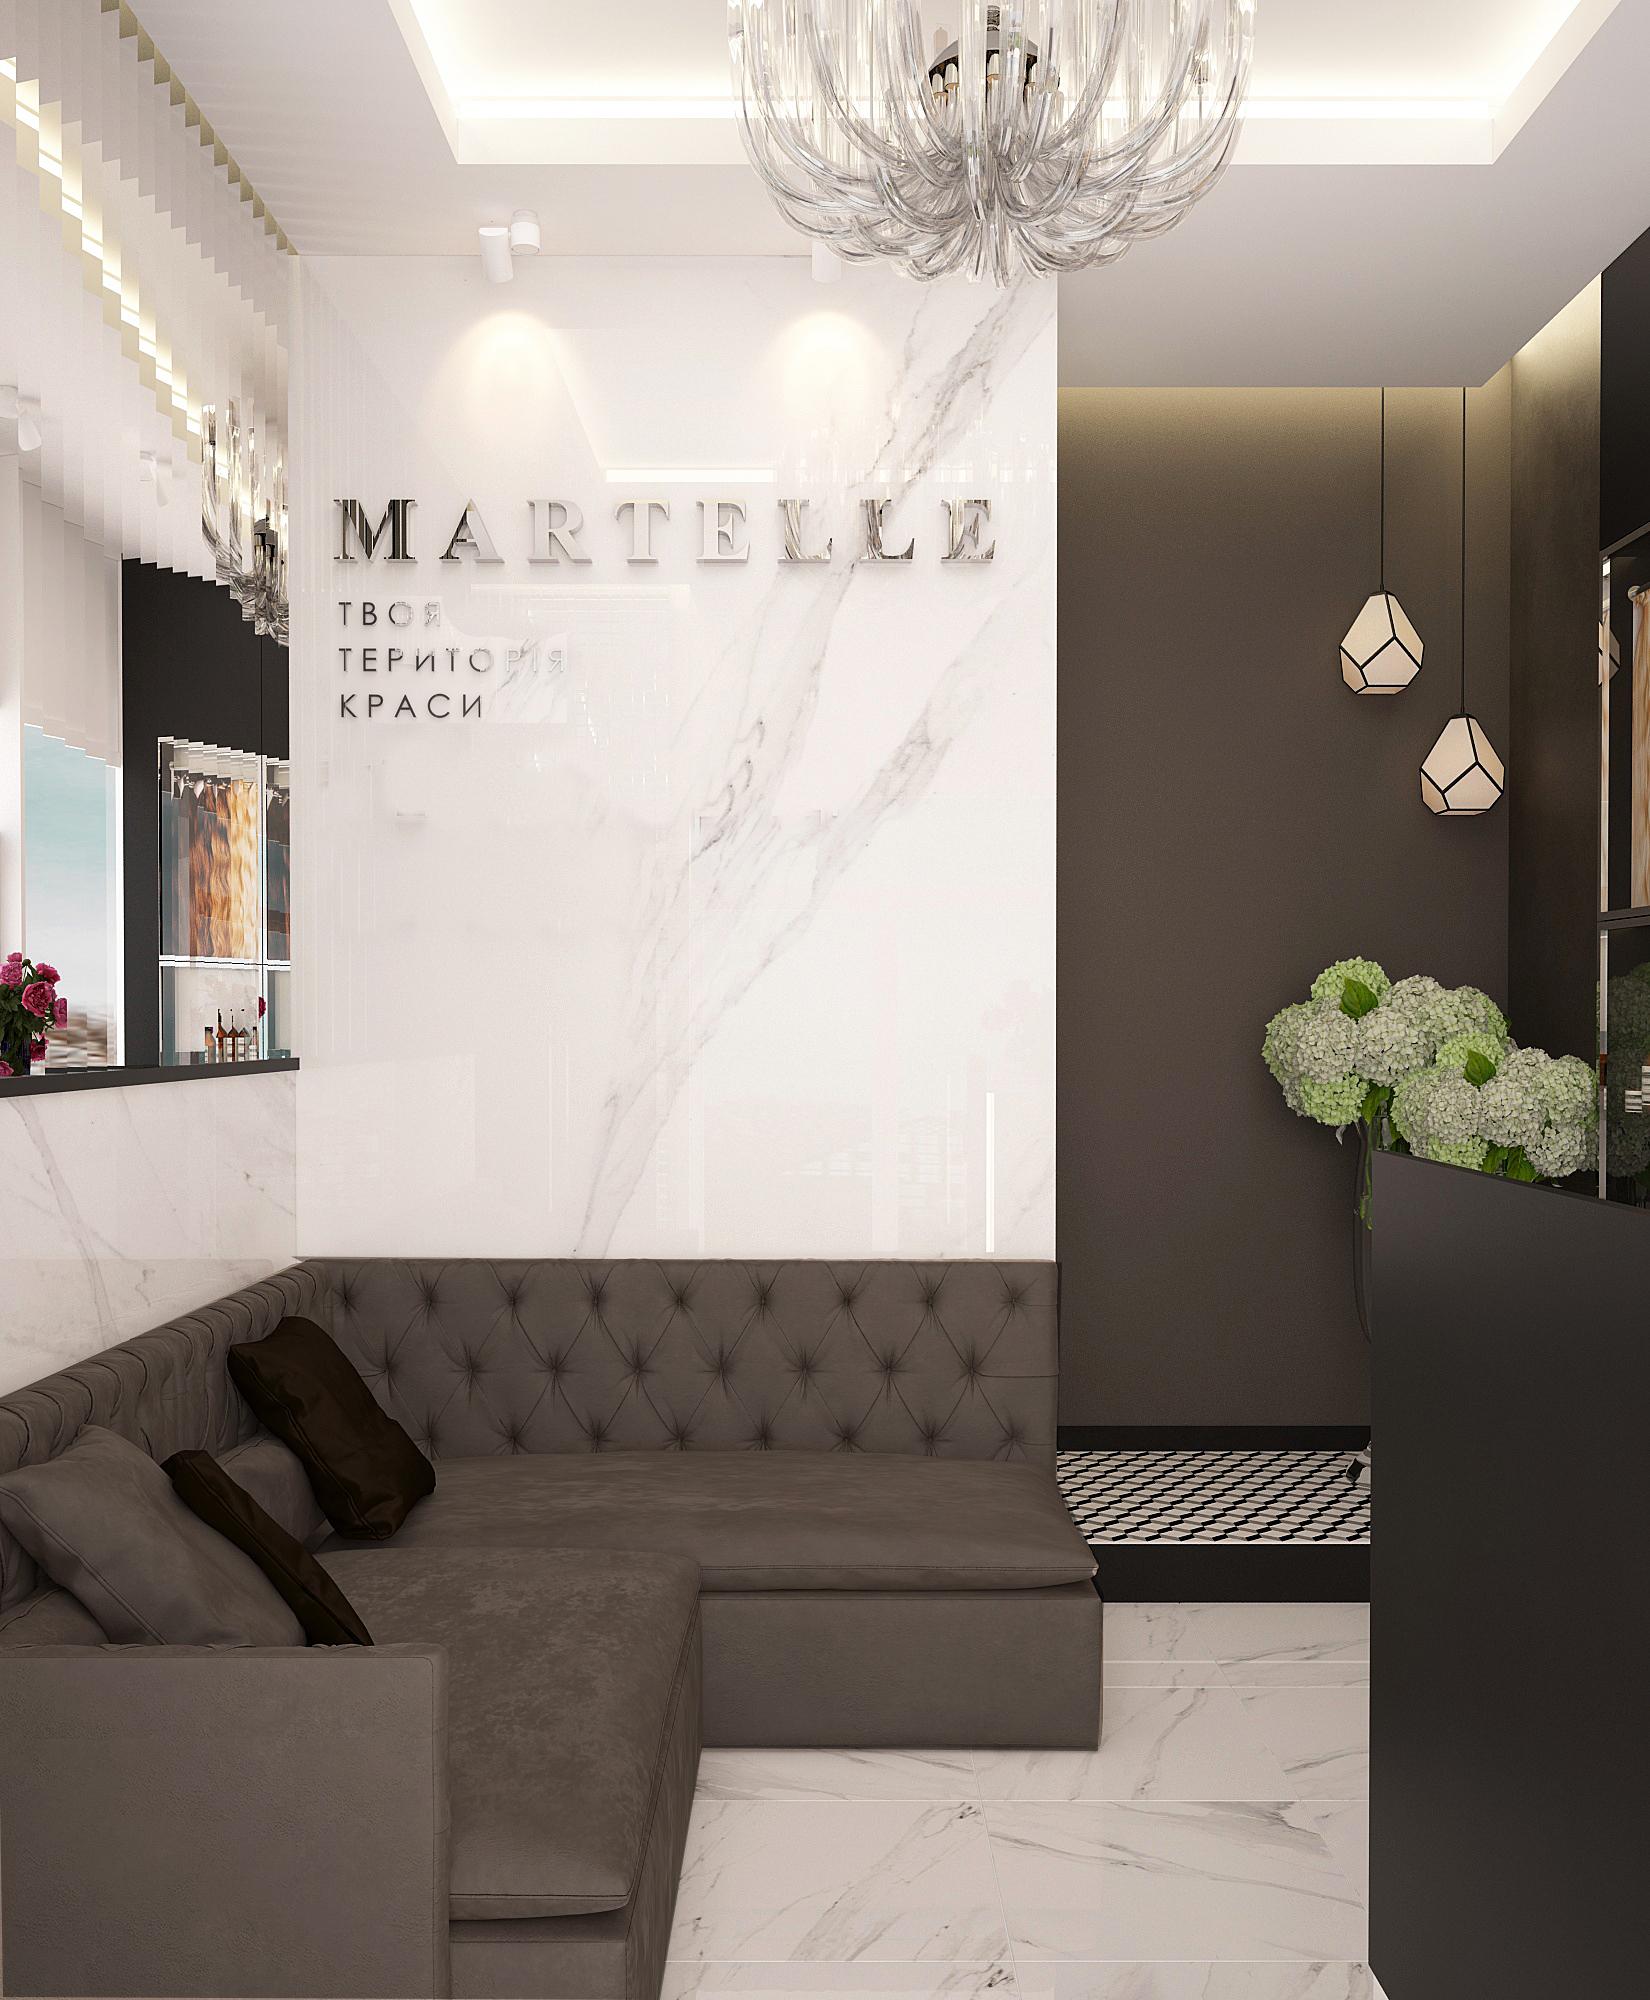 martelle(1)_990x1200